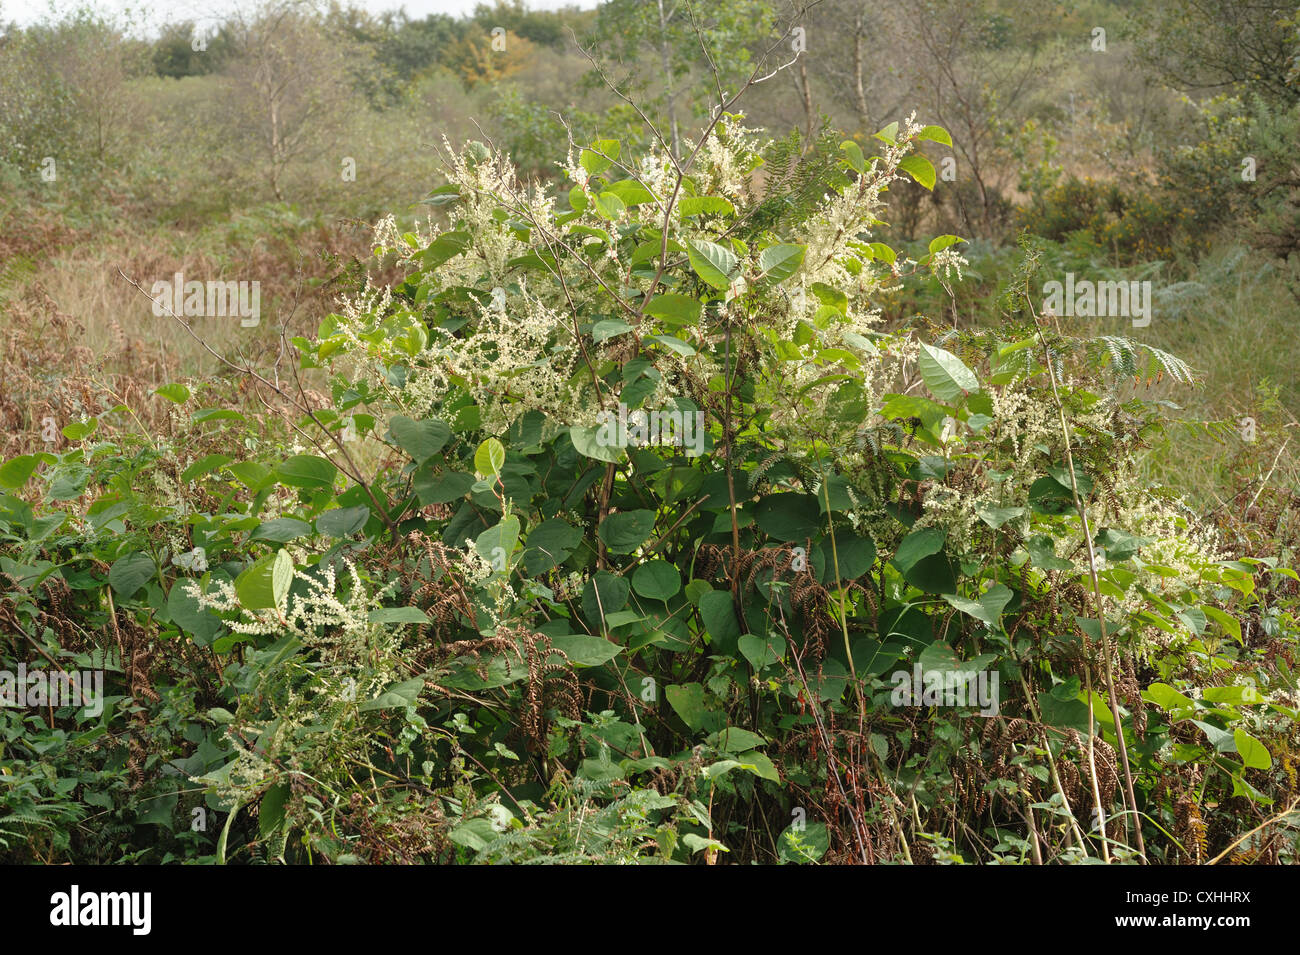 Japanese knotweed (Reynoutria japonica)flowering plants Stock Photo